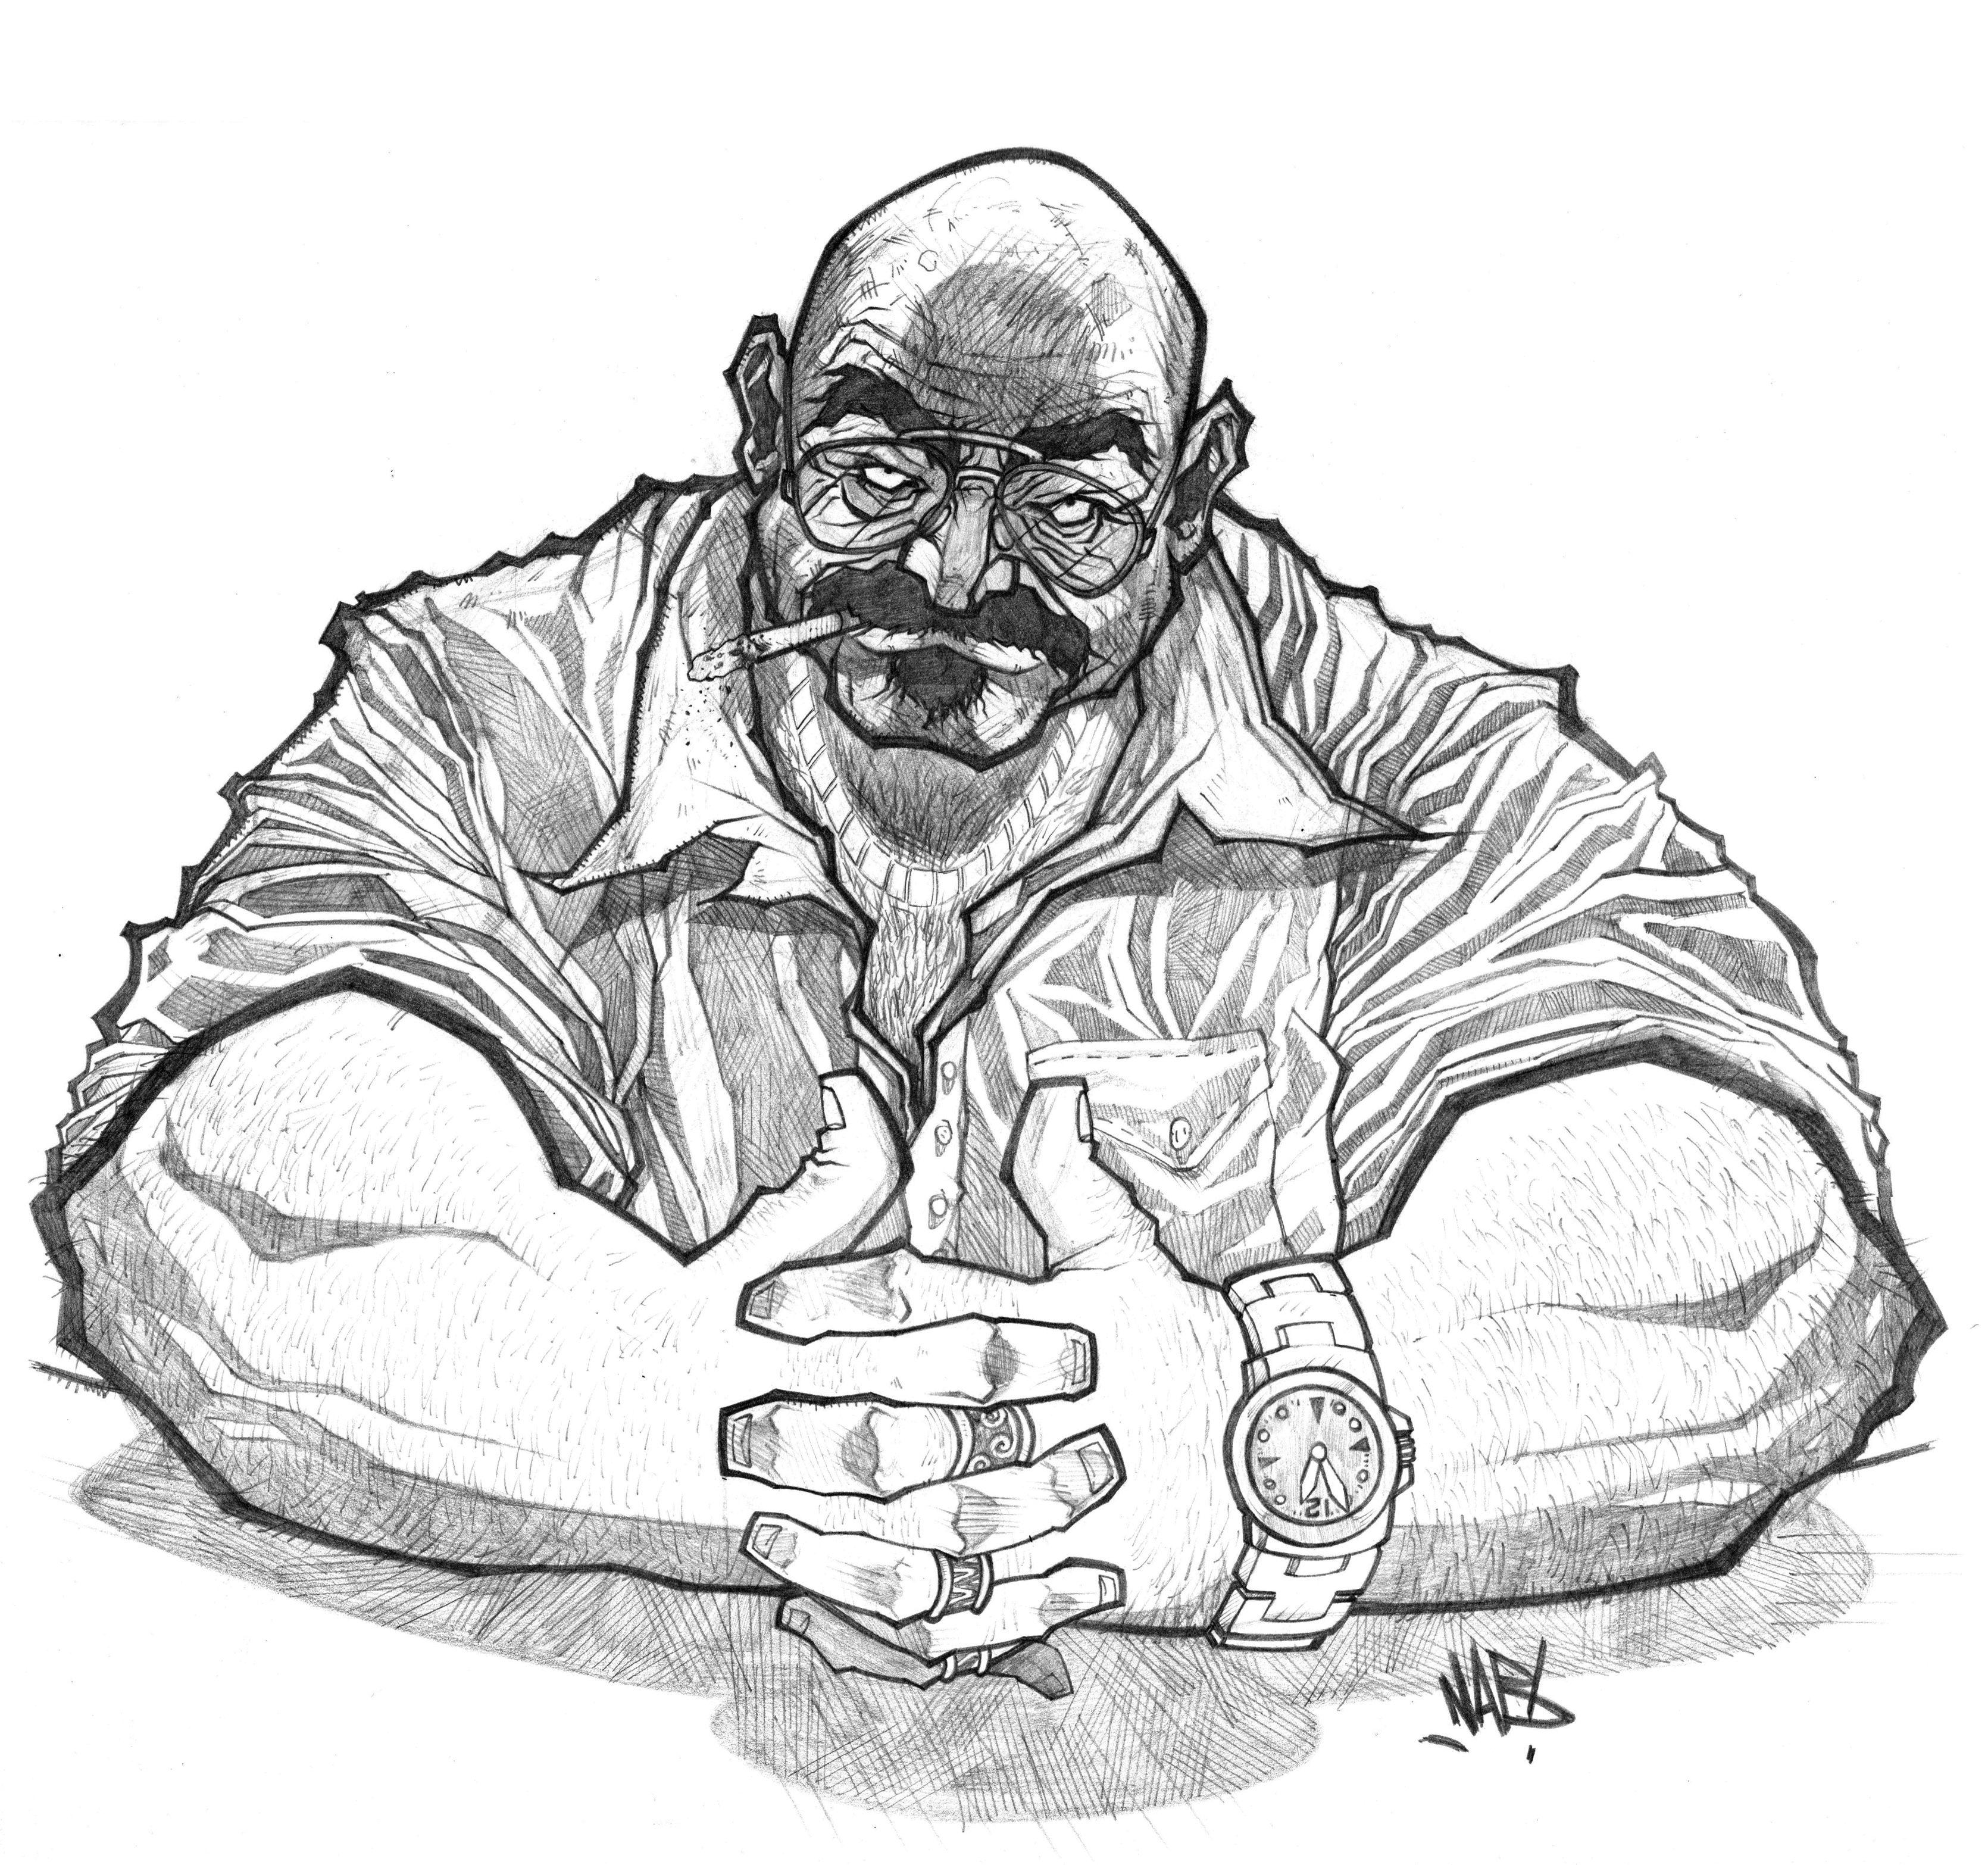 Mafia Big Boss My Drawings Character Design Inspiration Sketches